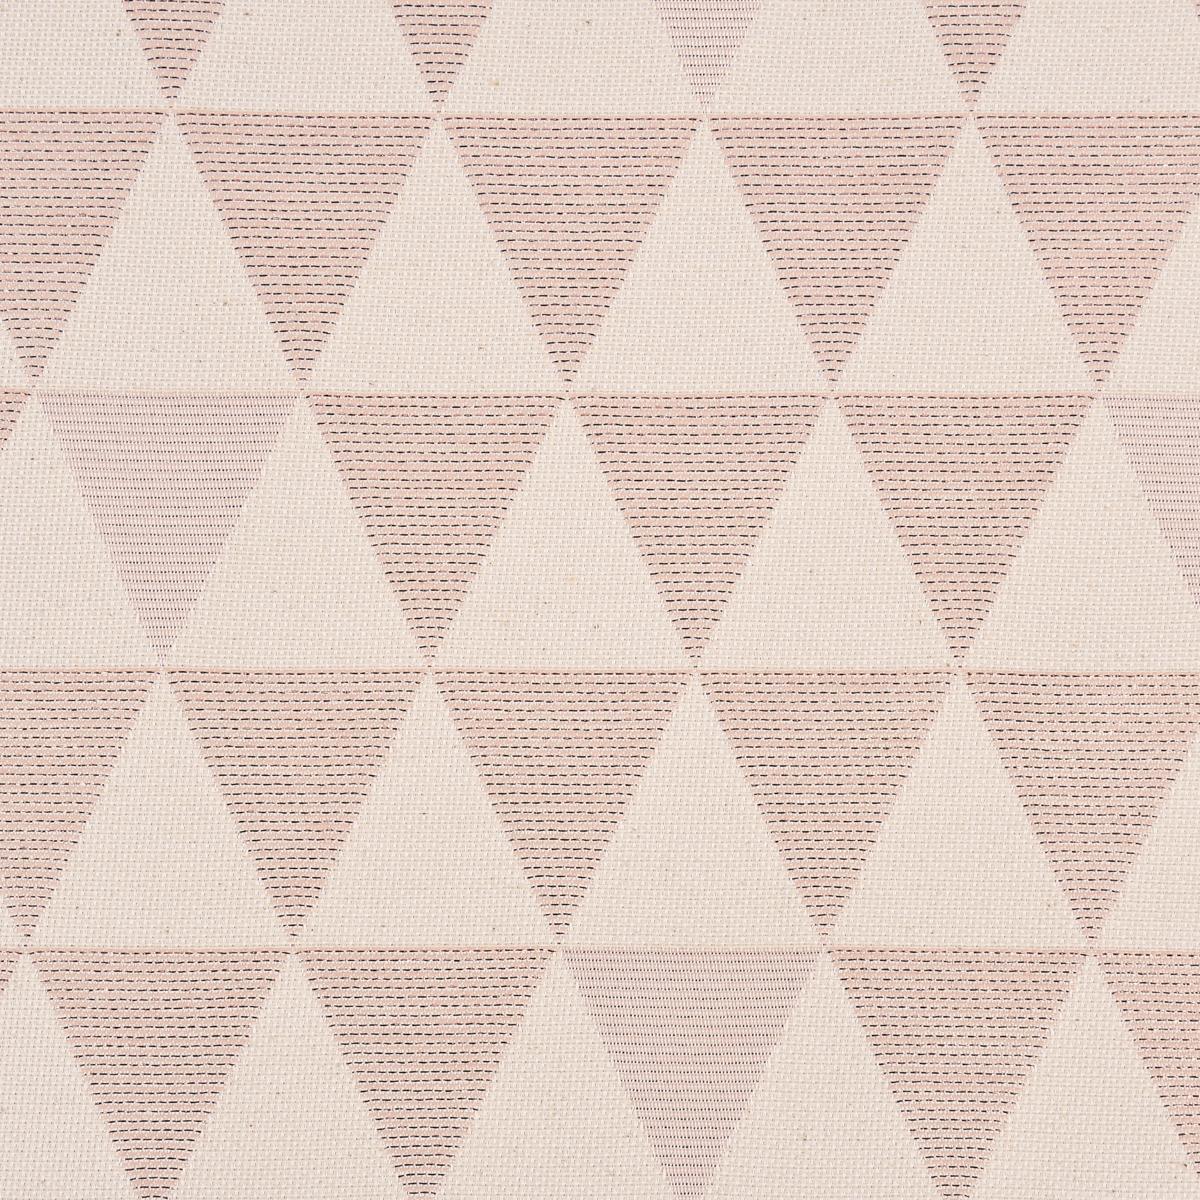 Dekostoff Jacquard Doubleface Premium Metallic Triangel Retro Scandi rosa hellbeige 1,4m Breite